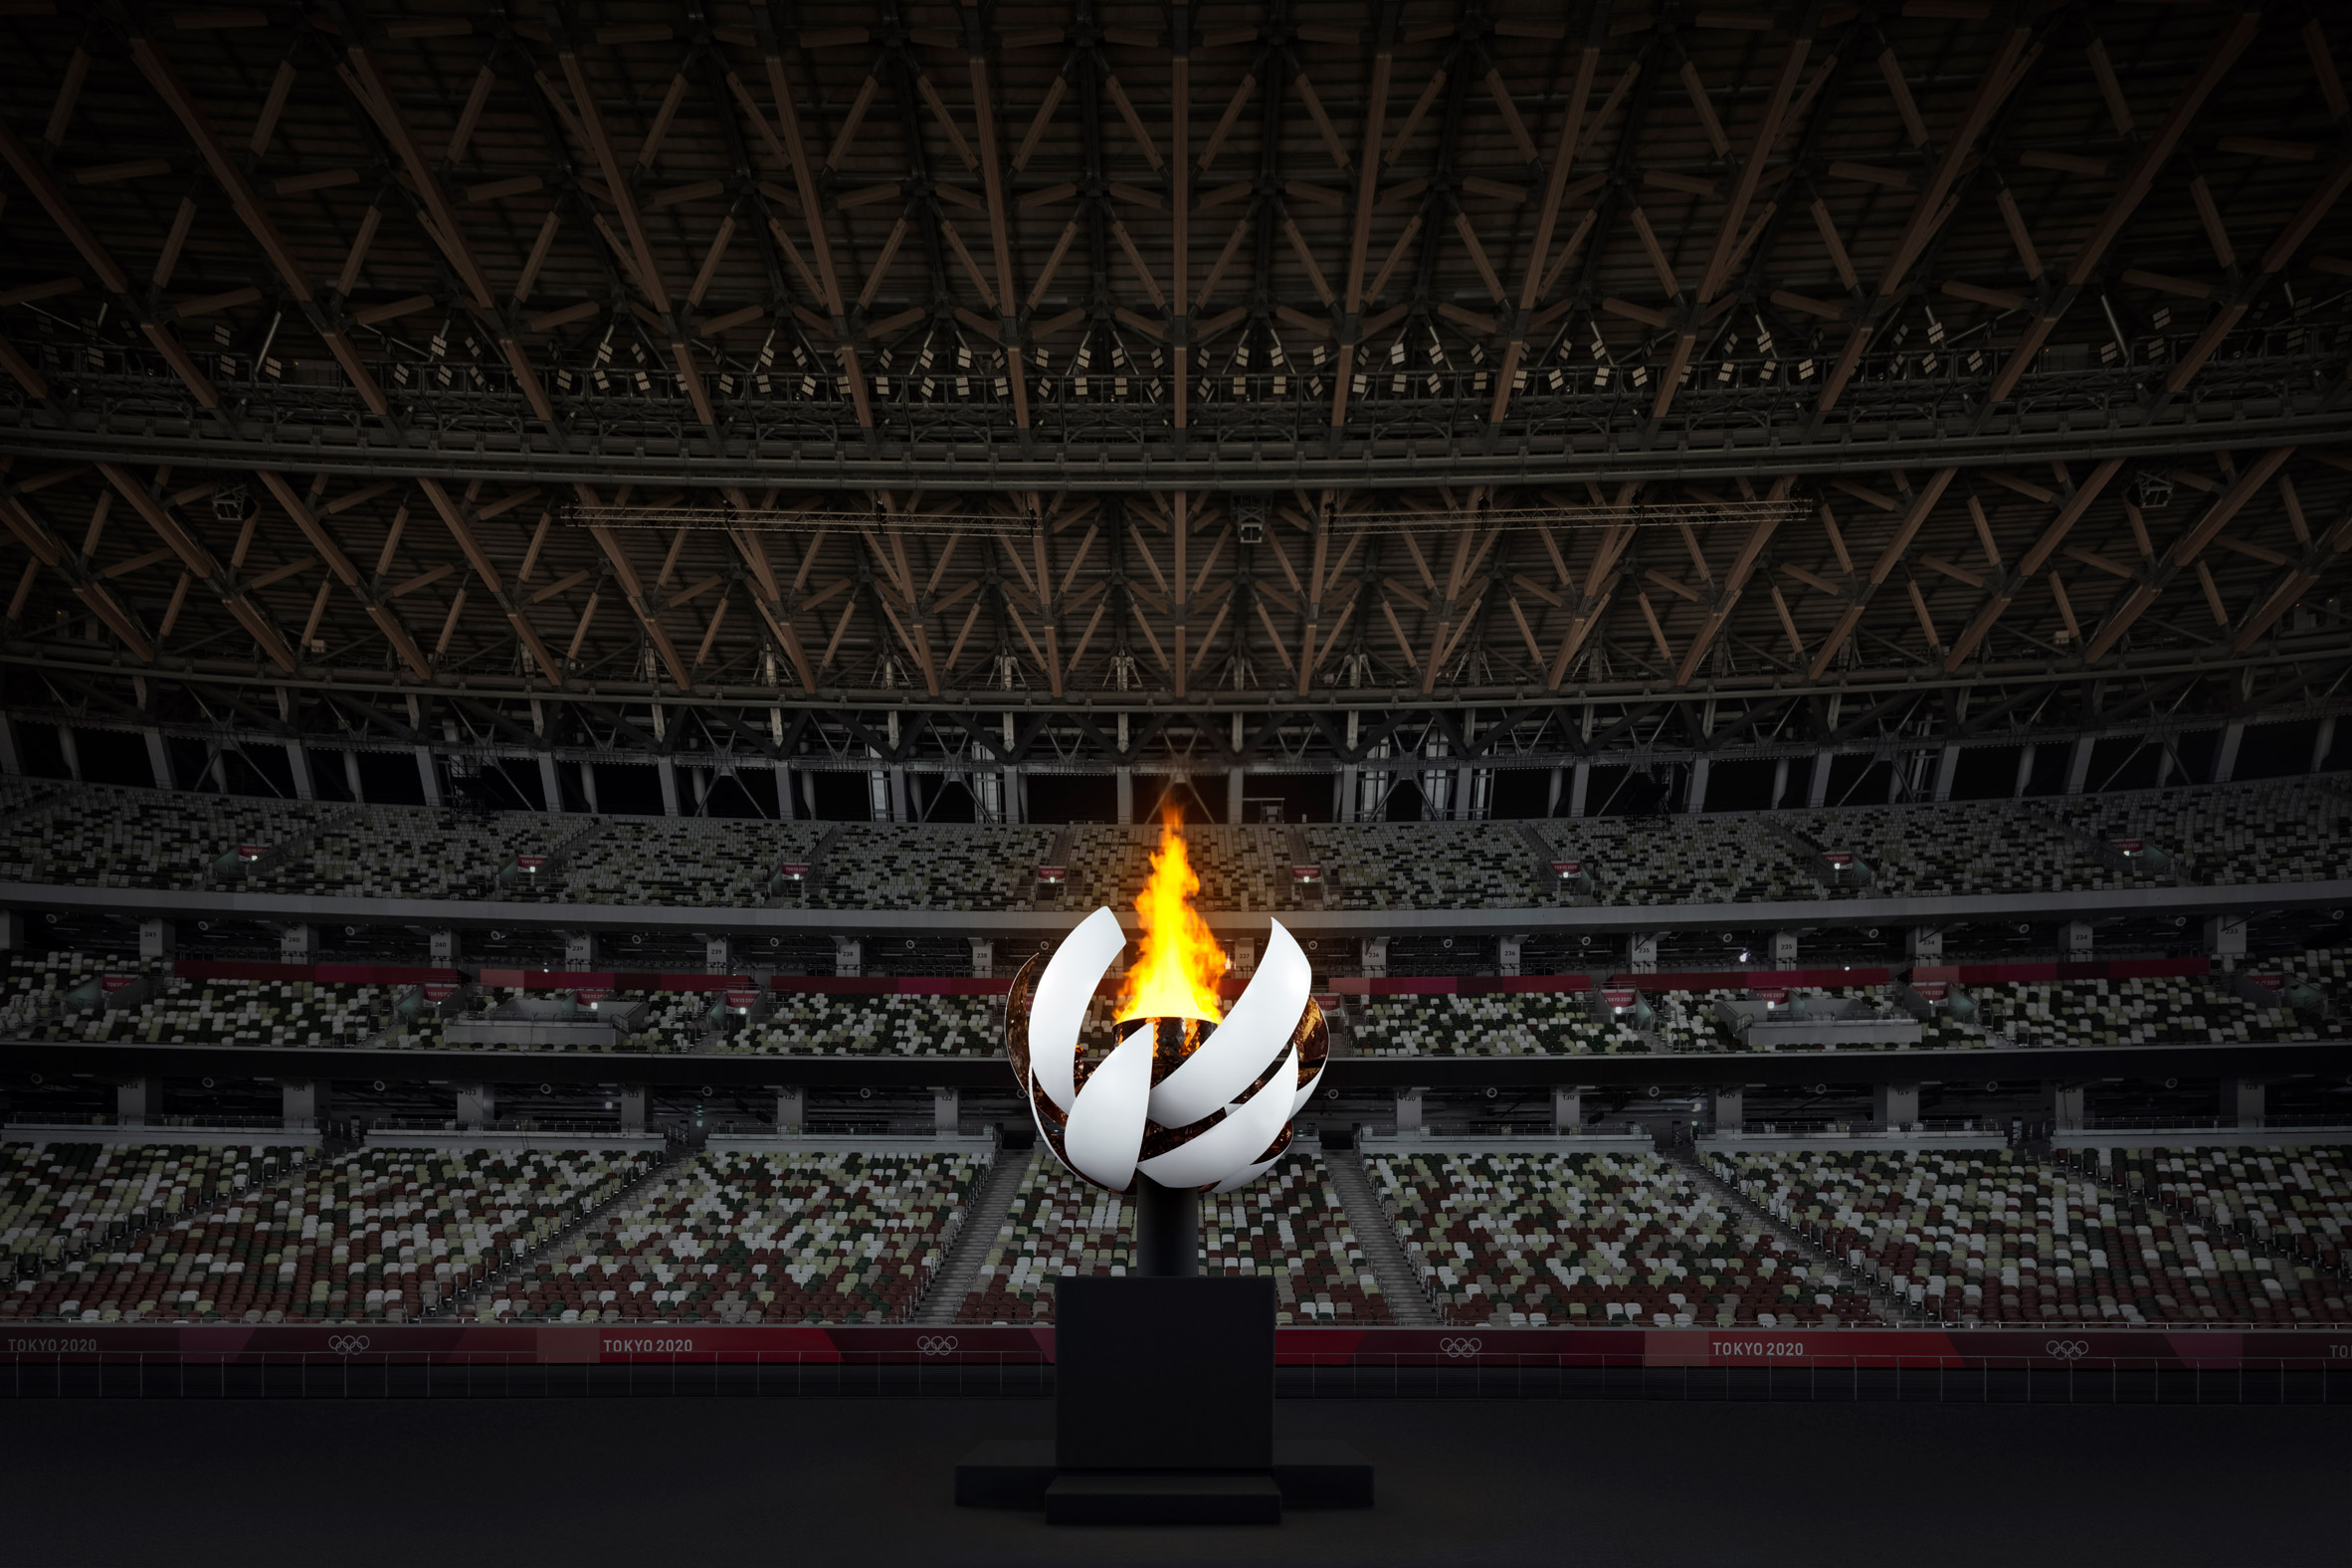 Nendo's Olympic cauldron